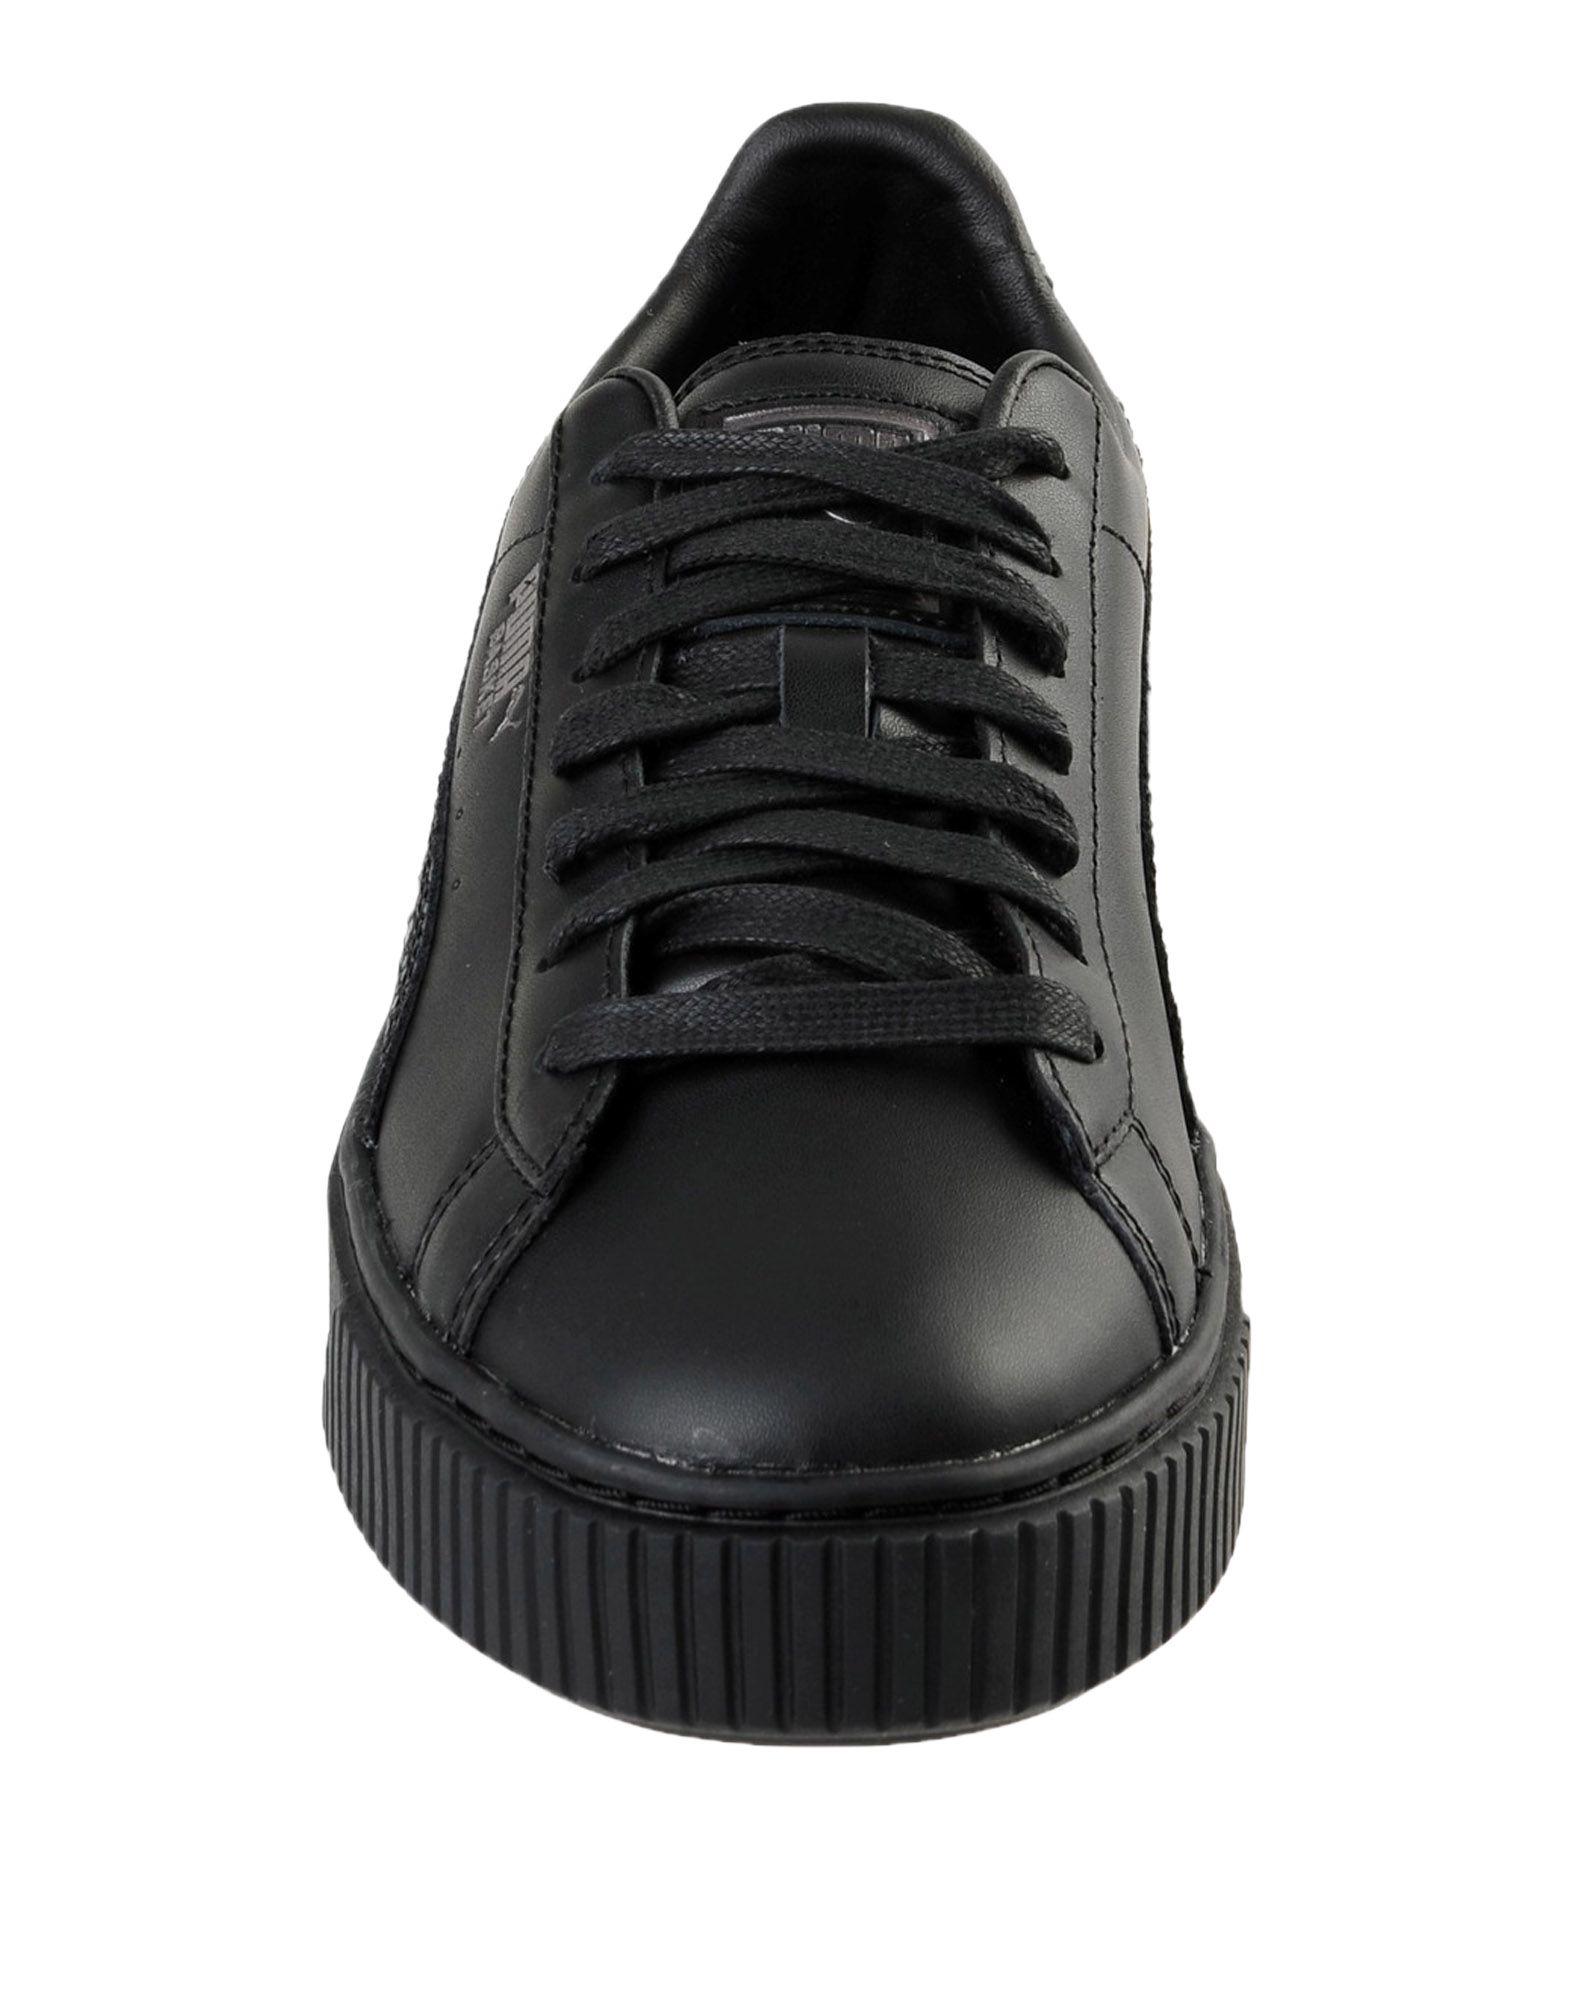 Gut um billige Schuhe zu Metallic tragenPuma Basket Platform Euphoria Metallic zu  11541373PI 2a3478